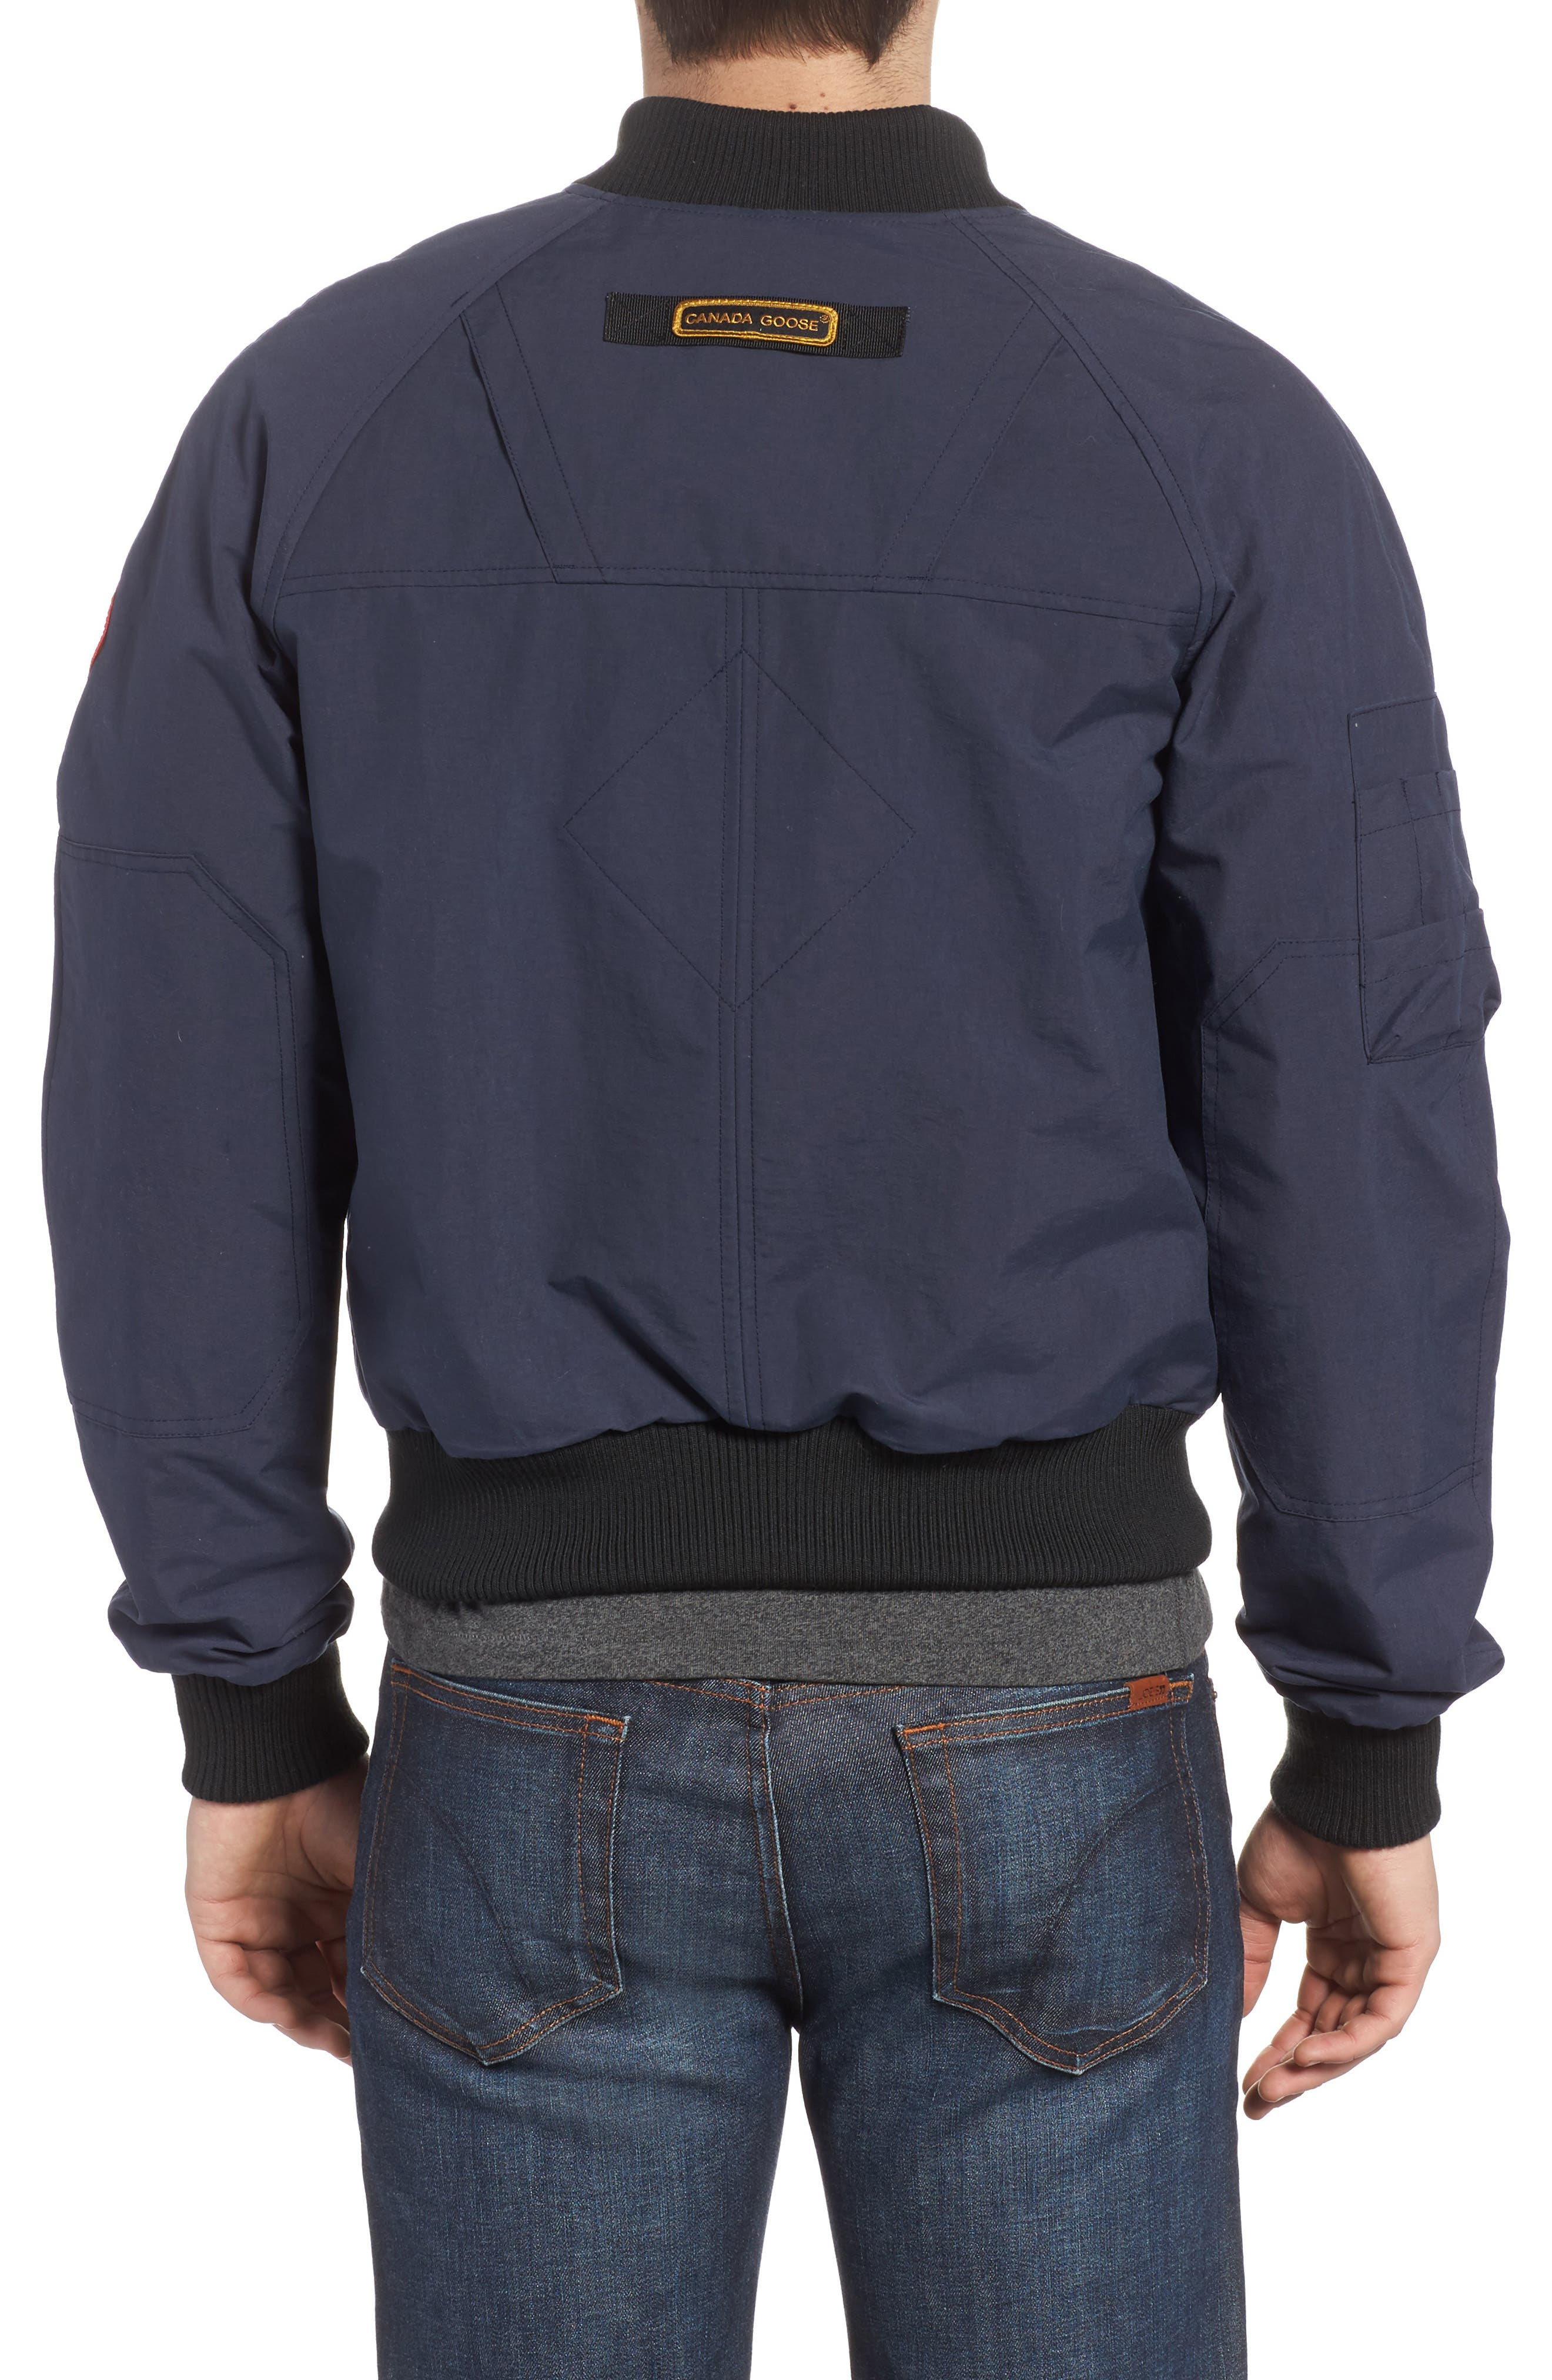 Faber Slim Fit Bomber Jacket,                             Alternate thumbnail 2, color,                             400